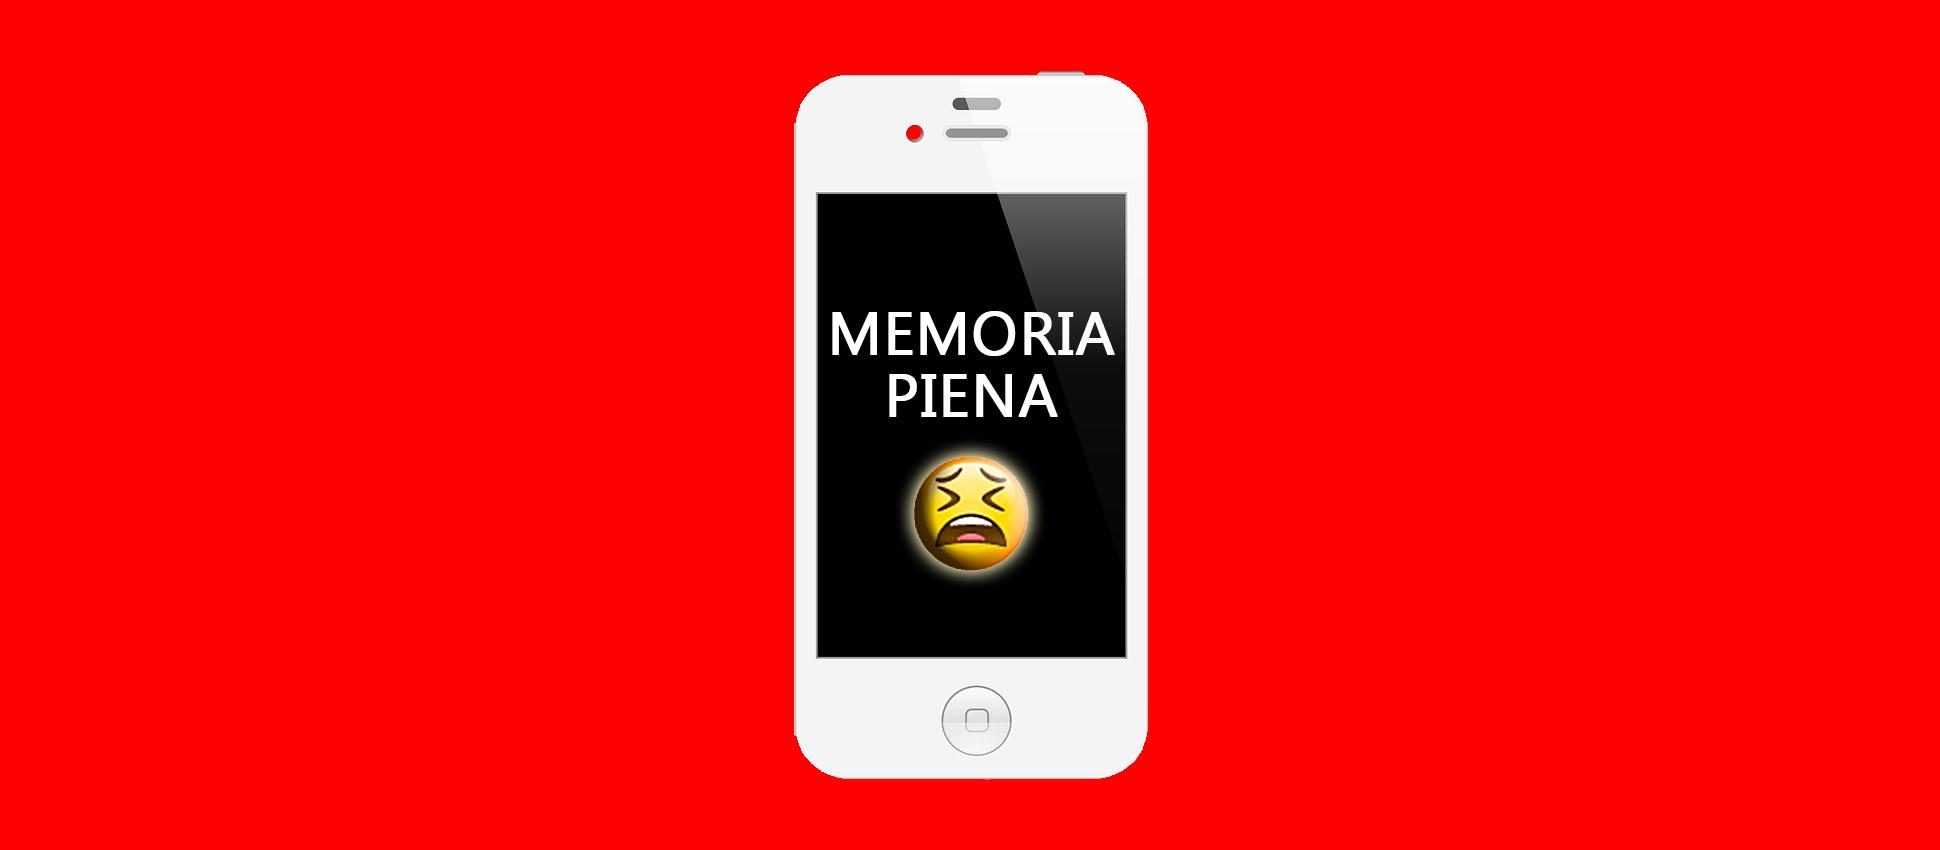 whatsapp memoria piena